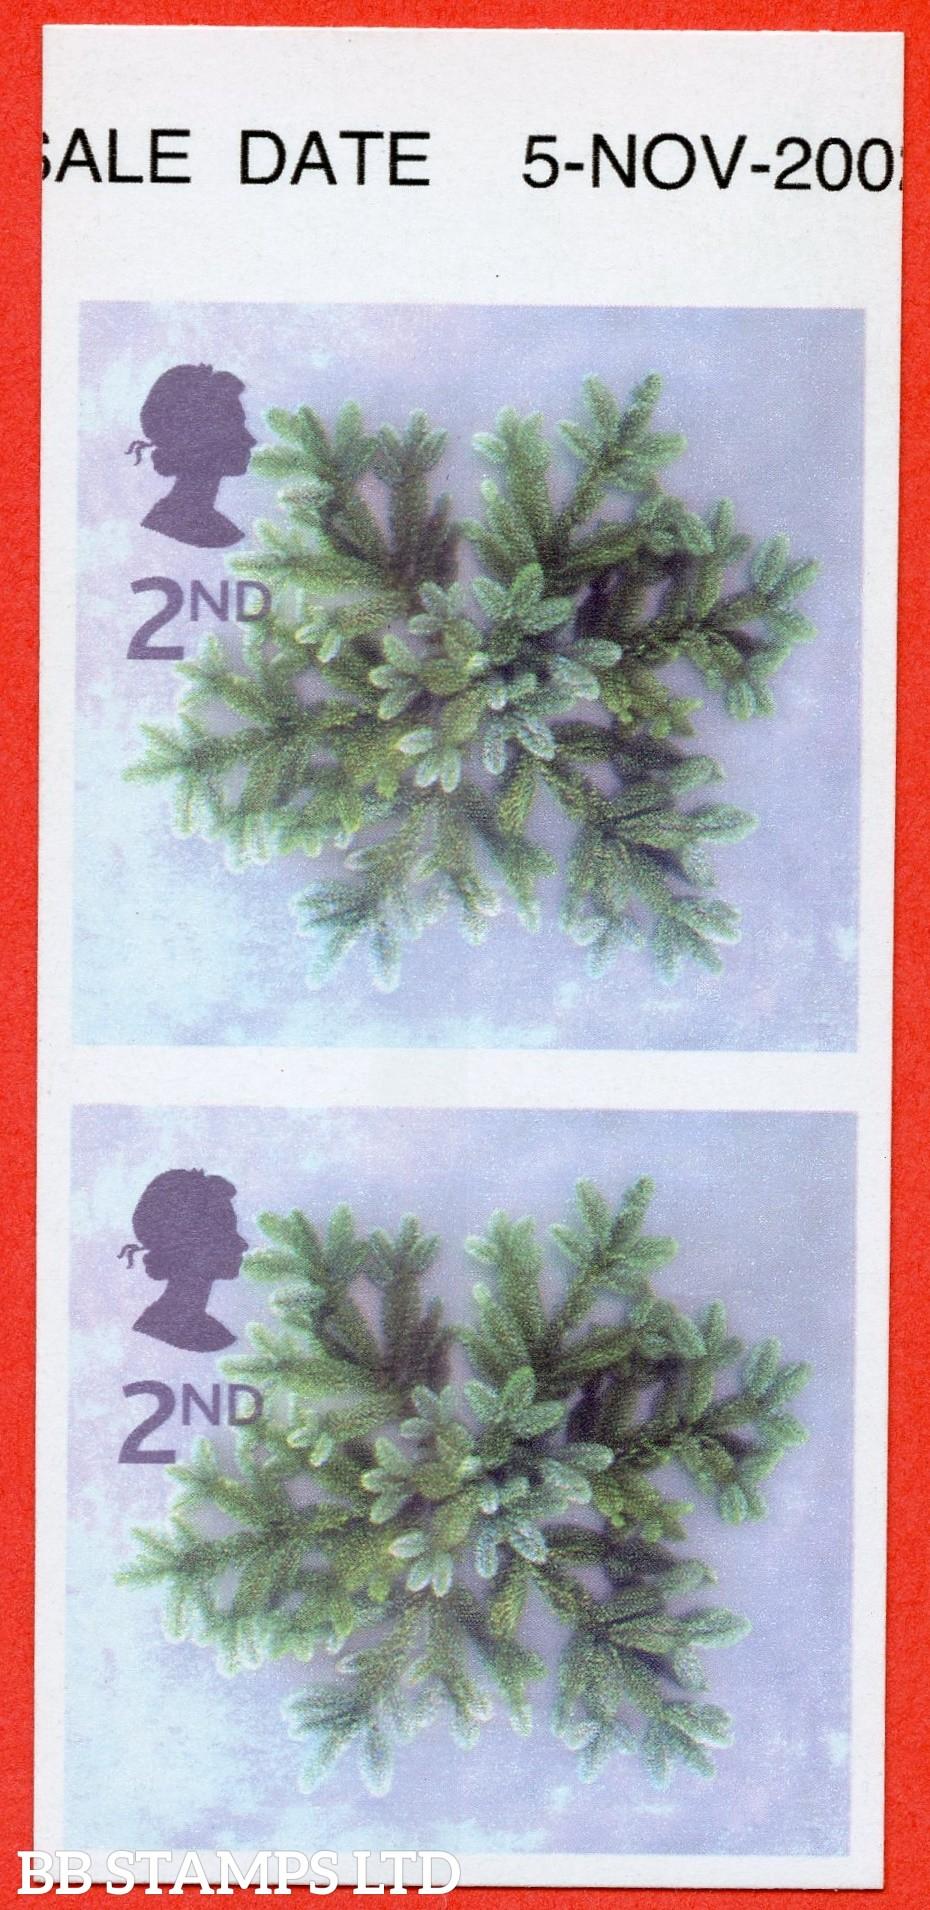 SG. 2321b. 2002 Christmas 2nd class. A fine UNMOUNTED MINT IMPERF ERROR top marginal vertical pair.